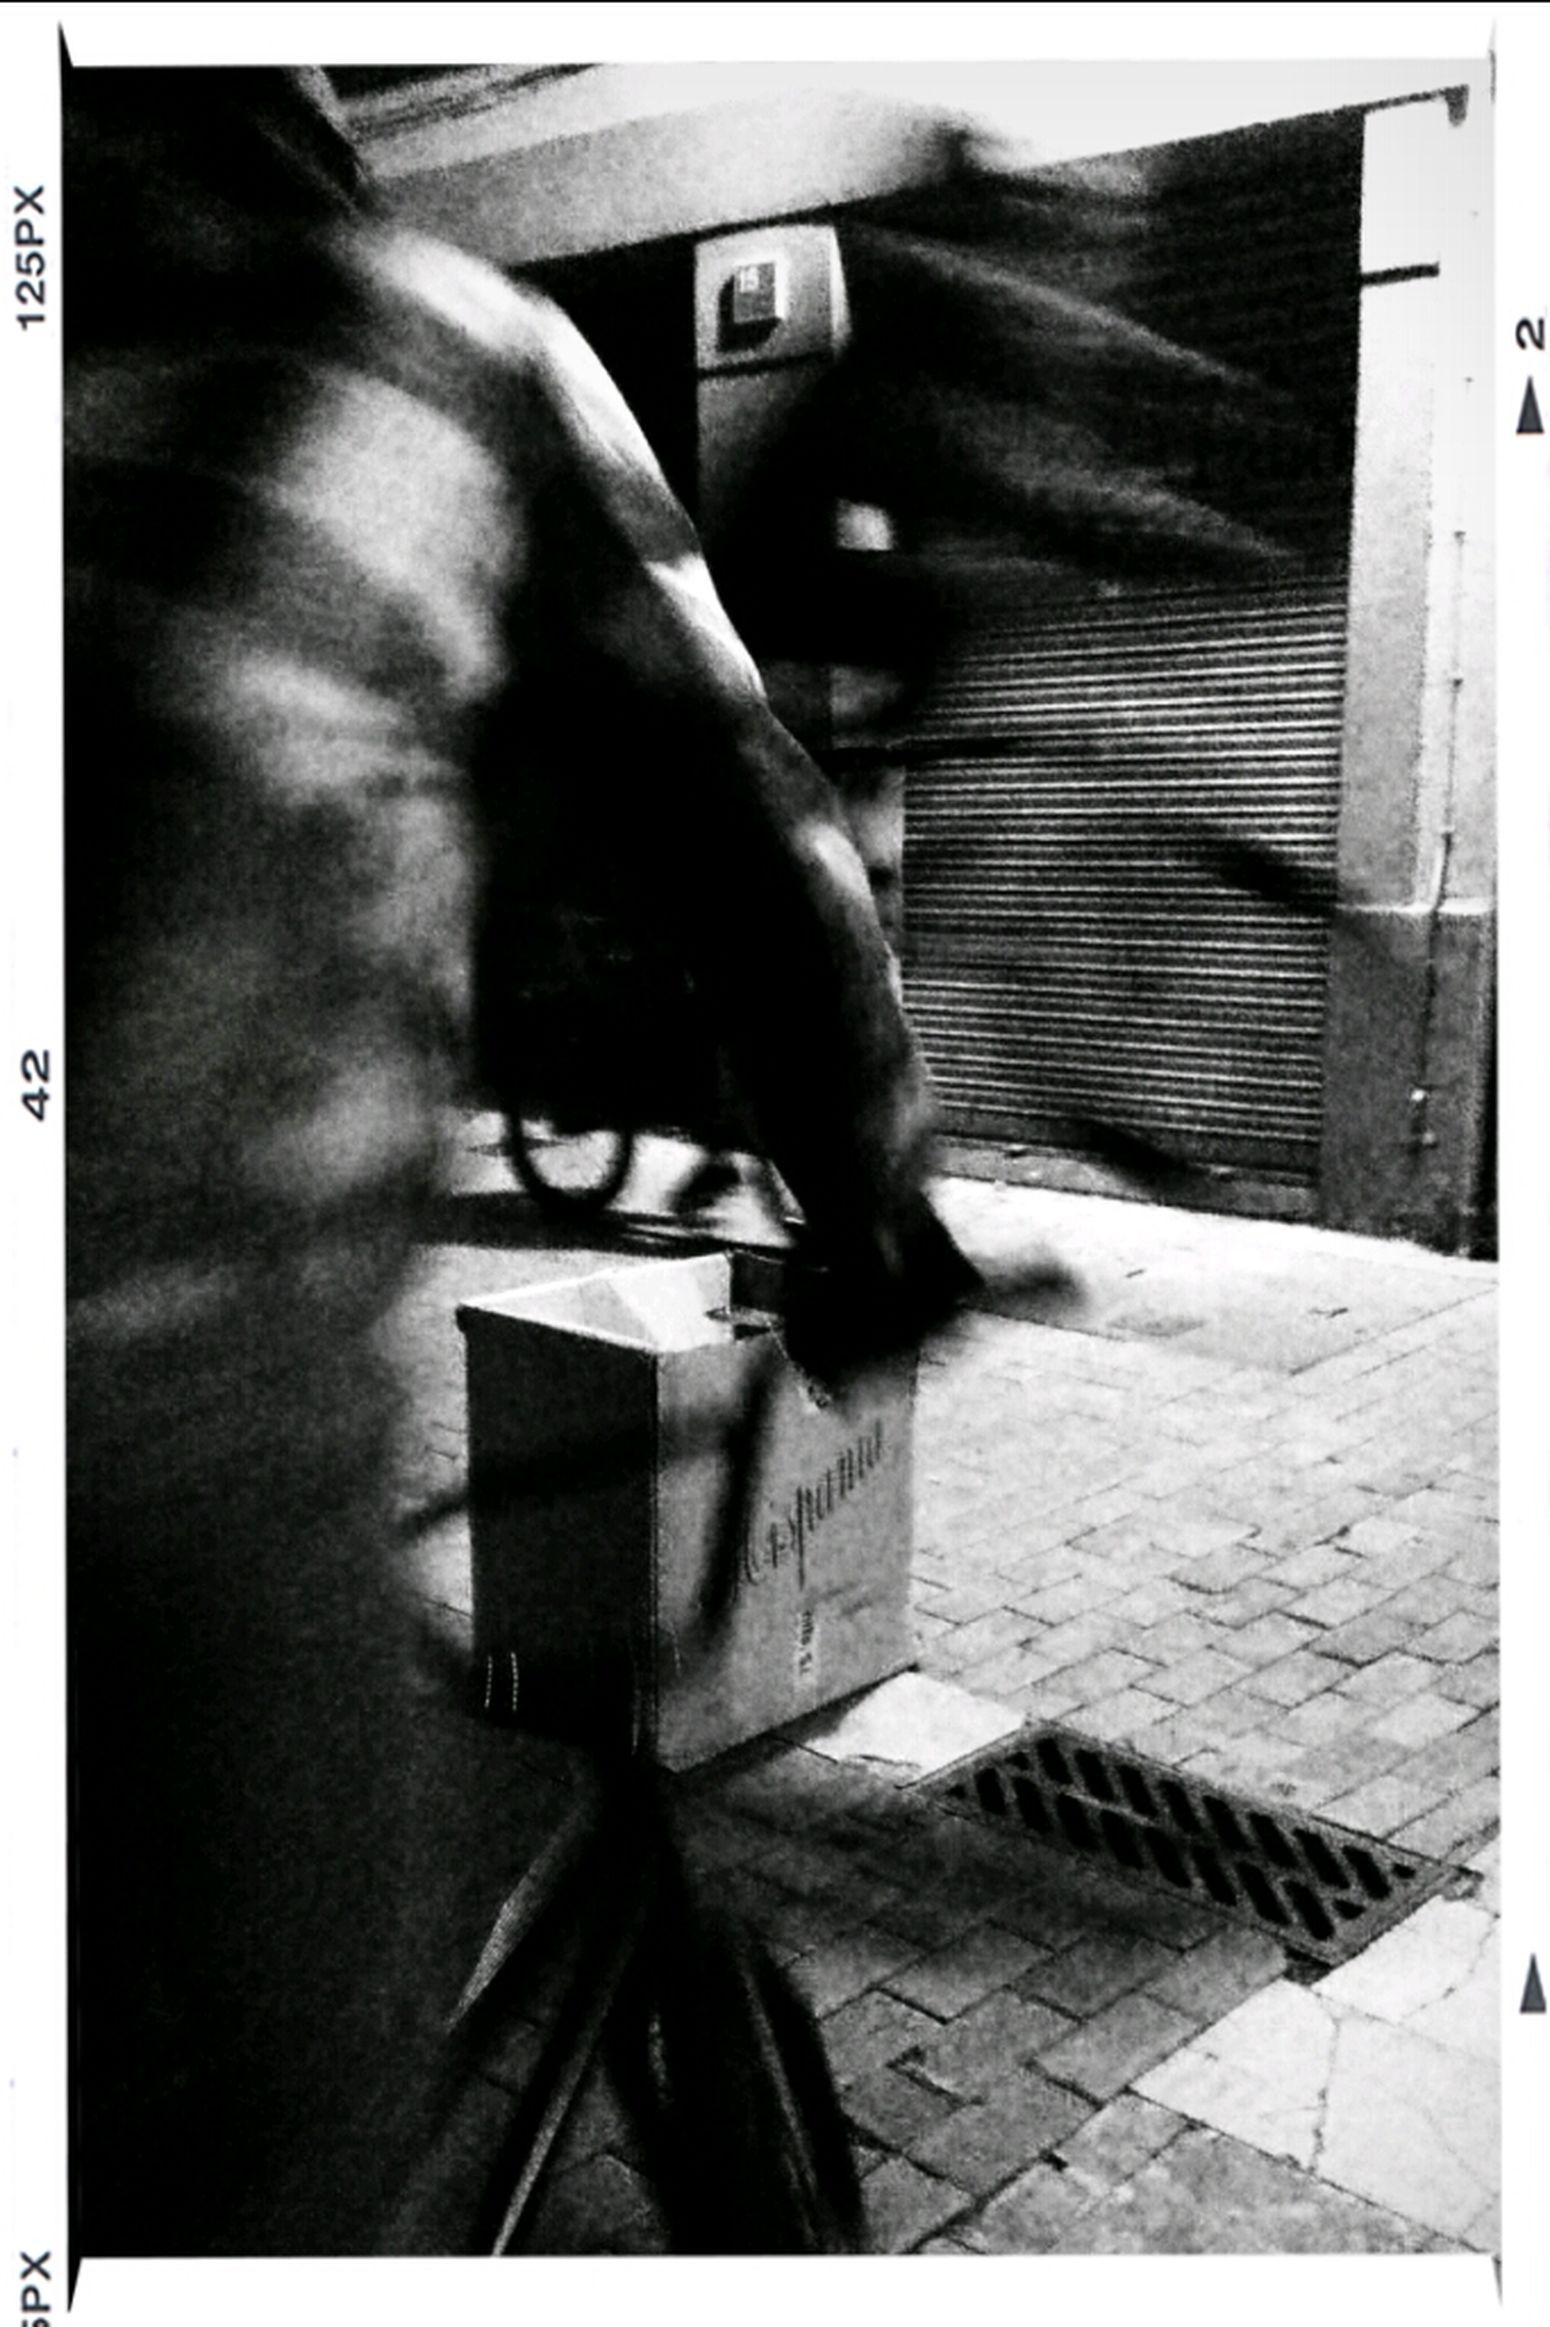 *STREETBOYS* Blackandwhite Streetphoto_bw Movilgrafias Streetphotography